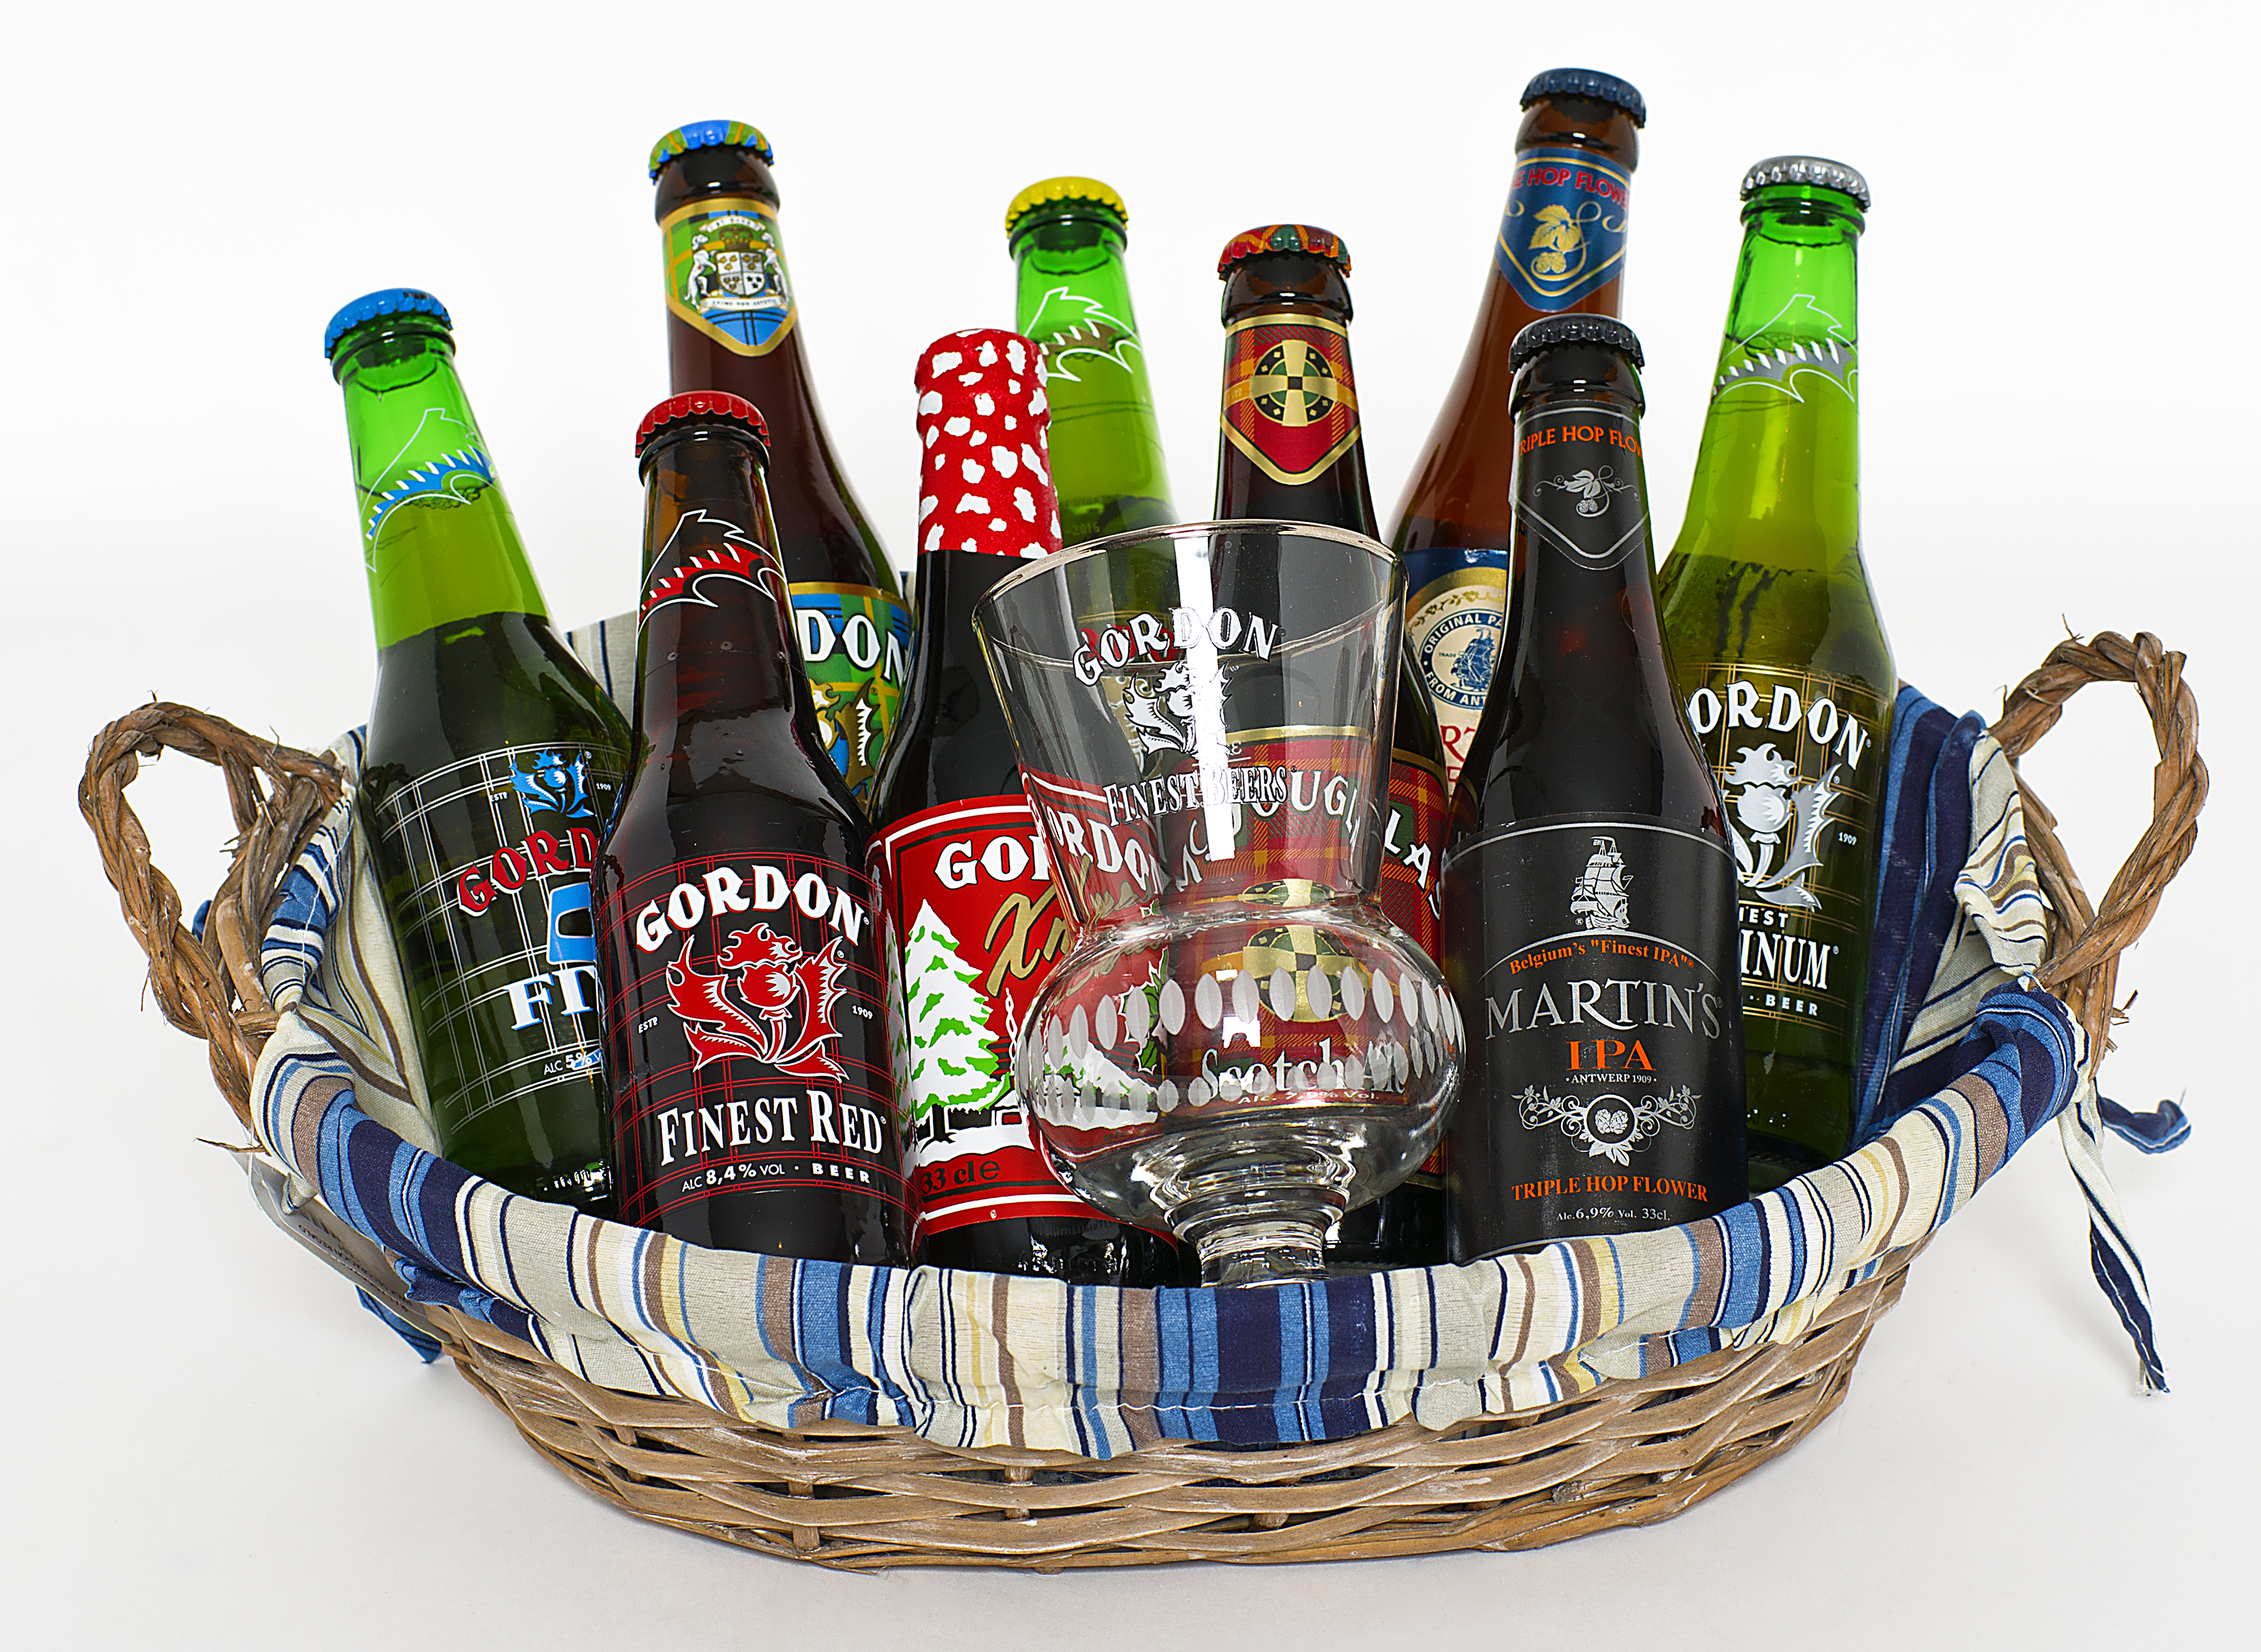 En 2015…¡Regala cerveza!: Cesta 'Gordon & Friends'